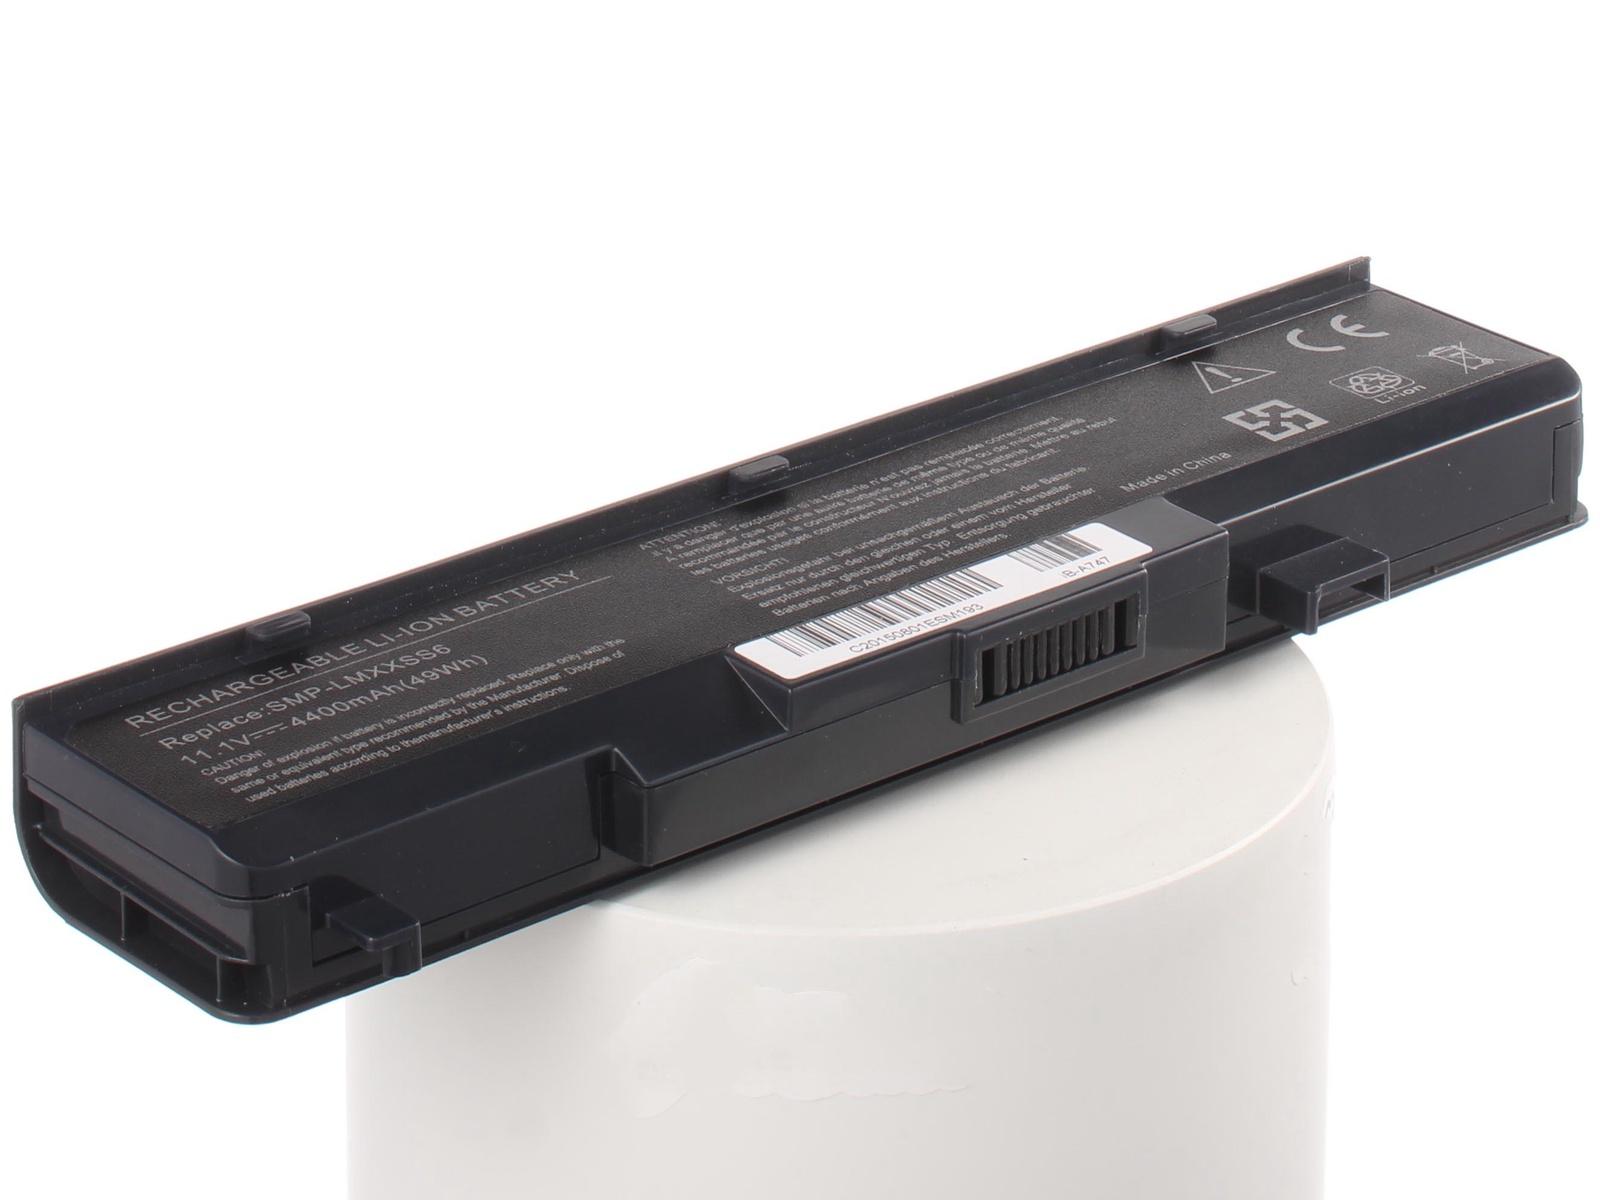 Аккумулятор для ноутбука iBatt Fujitsu-Siemens, Rover book SMP-LMXXSS3, DPK-LMXXSS3 аккумулятор для ноутбука hp compaq hstnn lb12 hstnn ib12 hstnn c02c hstnn ub12 hstnn ib27 nc4200 nc4400 tc4200 6cell tc4400 hstnn ib12